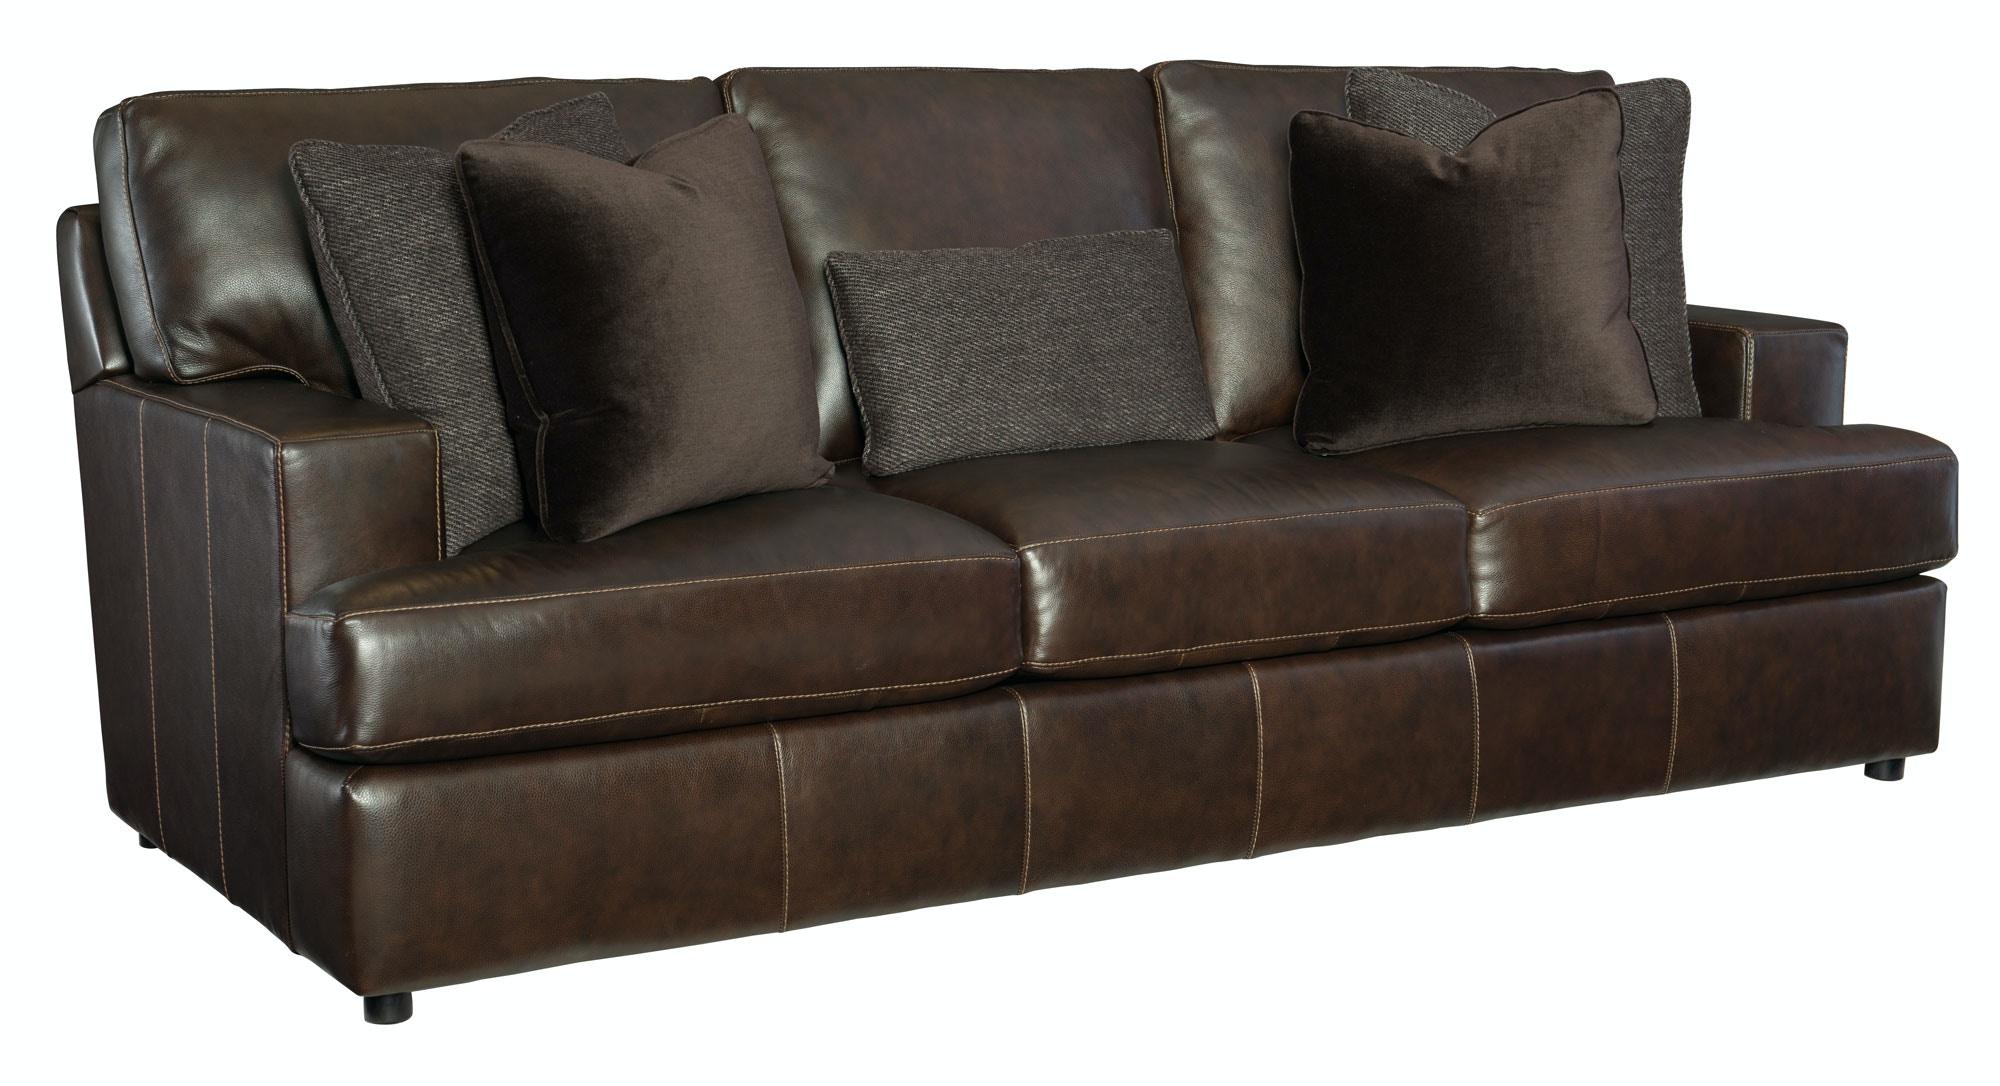 Bernhardt Furniture Winslow Sofa 3416L